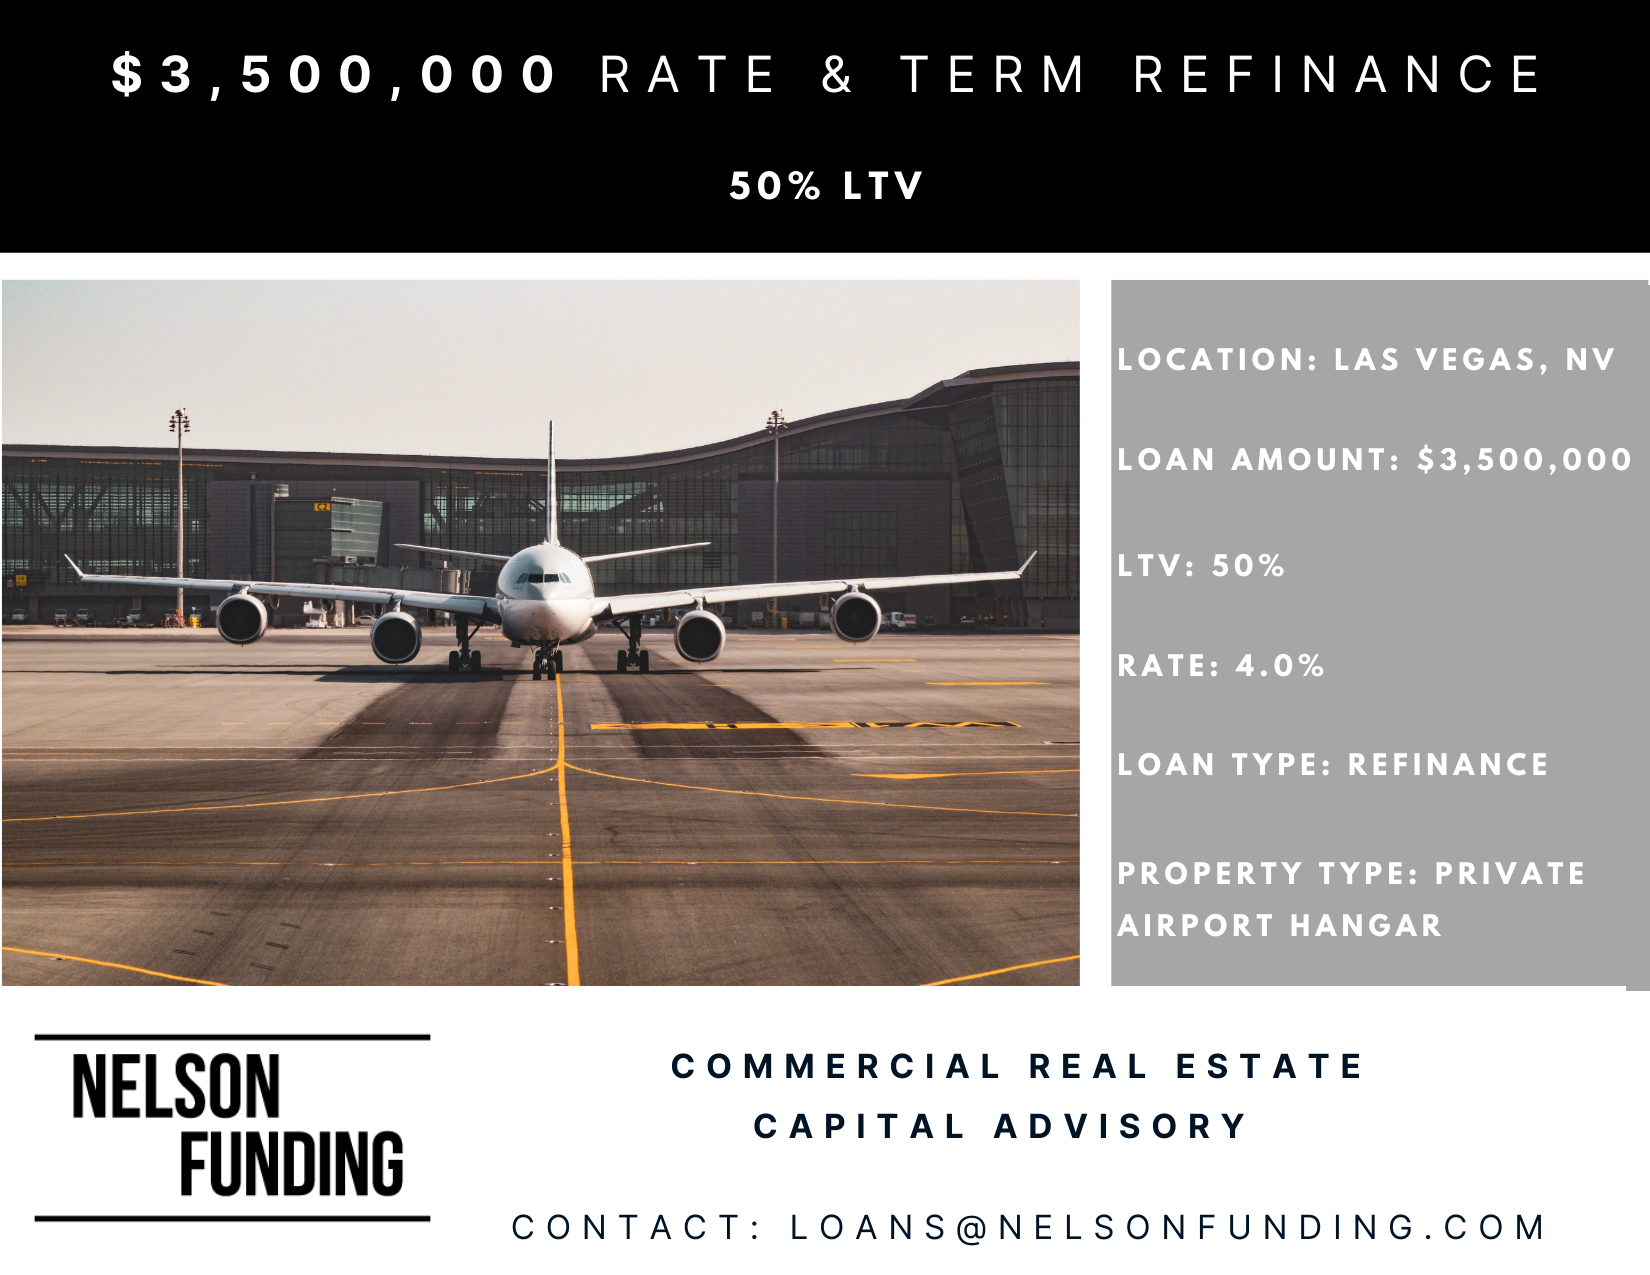 Closes $3,500,000 Refinance in Las Vegas, NV